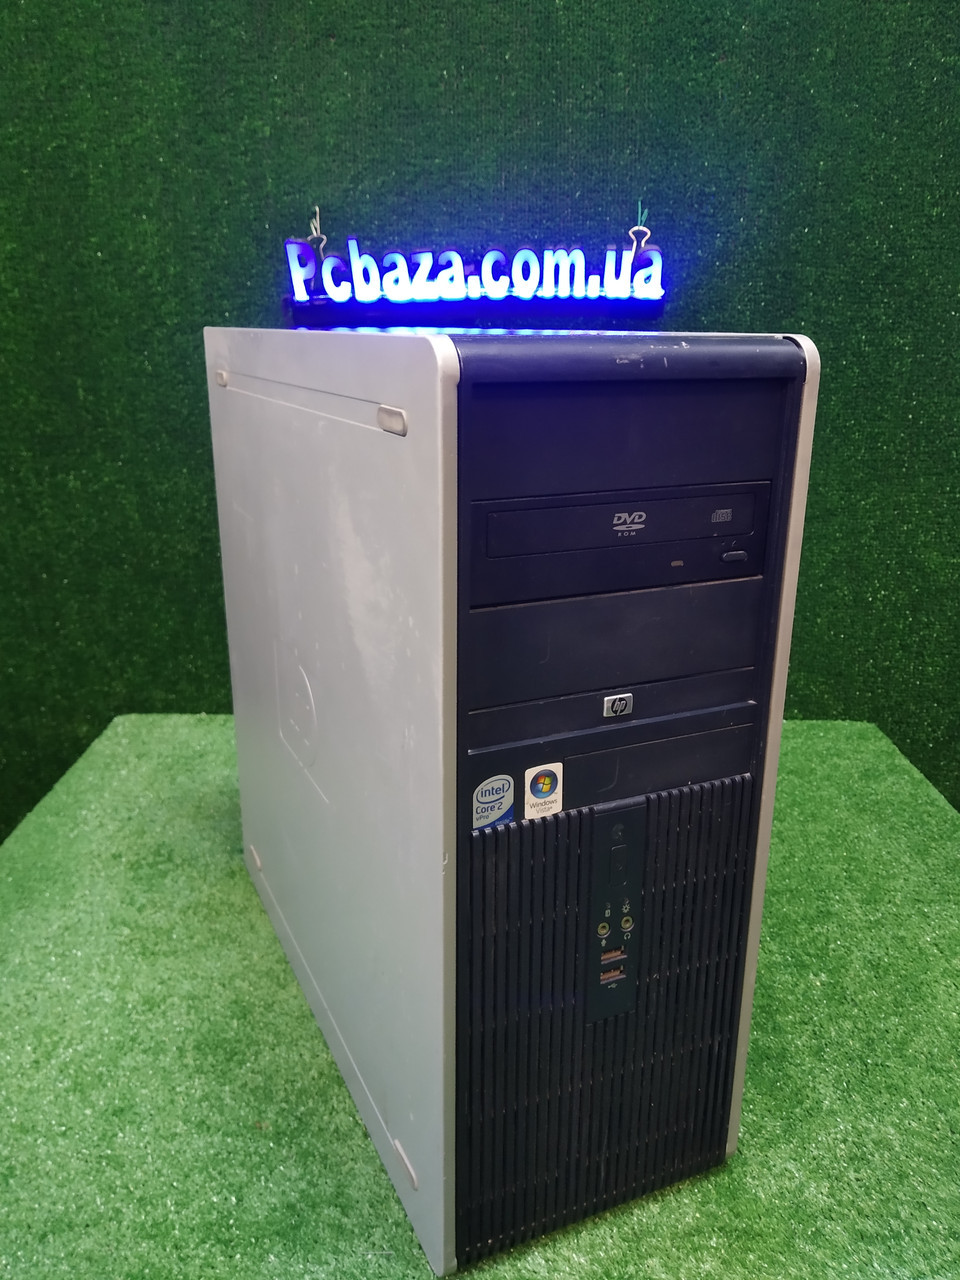 Компьютер HP dc 7800, Intel 2 мощных ядра E7500 2.93Ггц, 4 ГБ, 160 ГБ Настроен! Есть Опт! Гарантия!